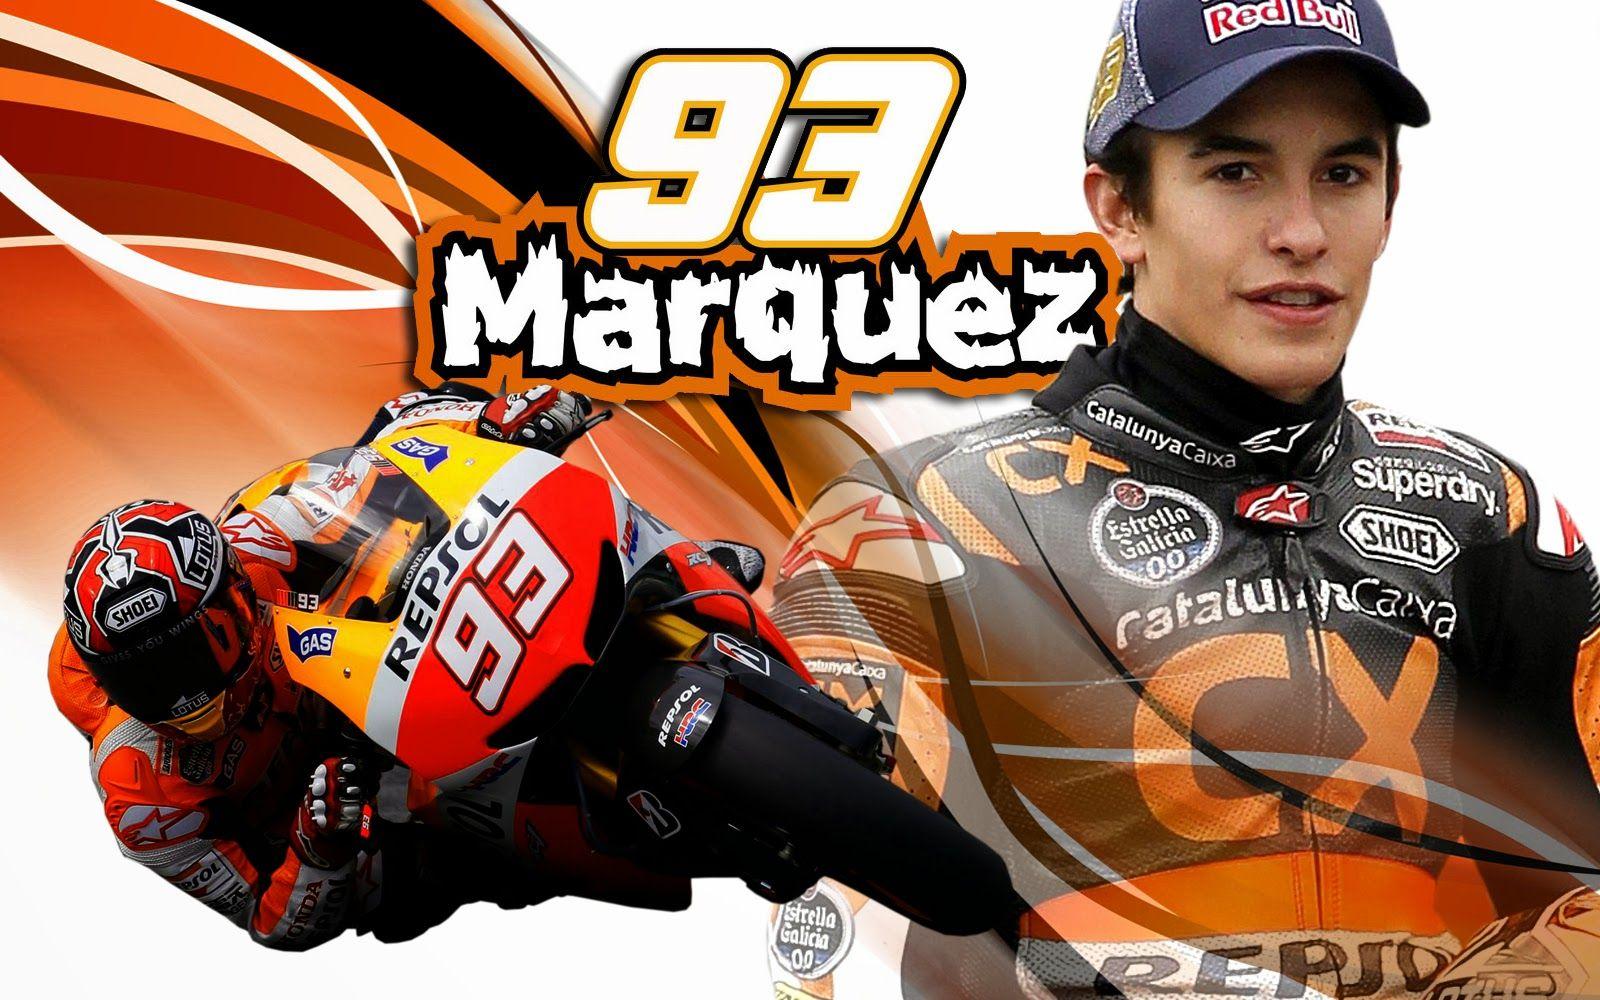 MotoGP Marc Marquez Wallpaper MotoGP Pinterest Marc Marquez